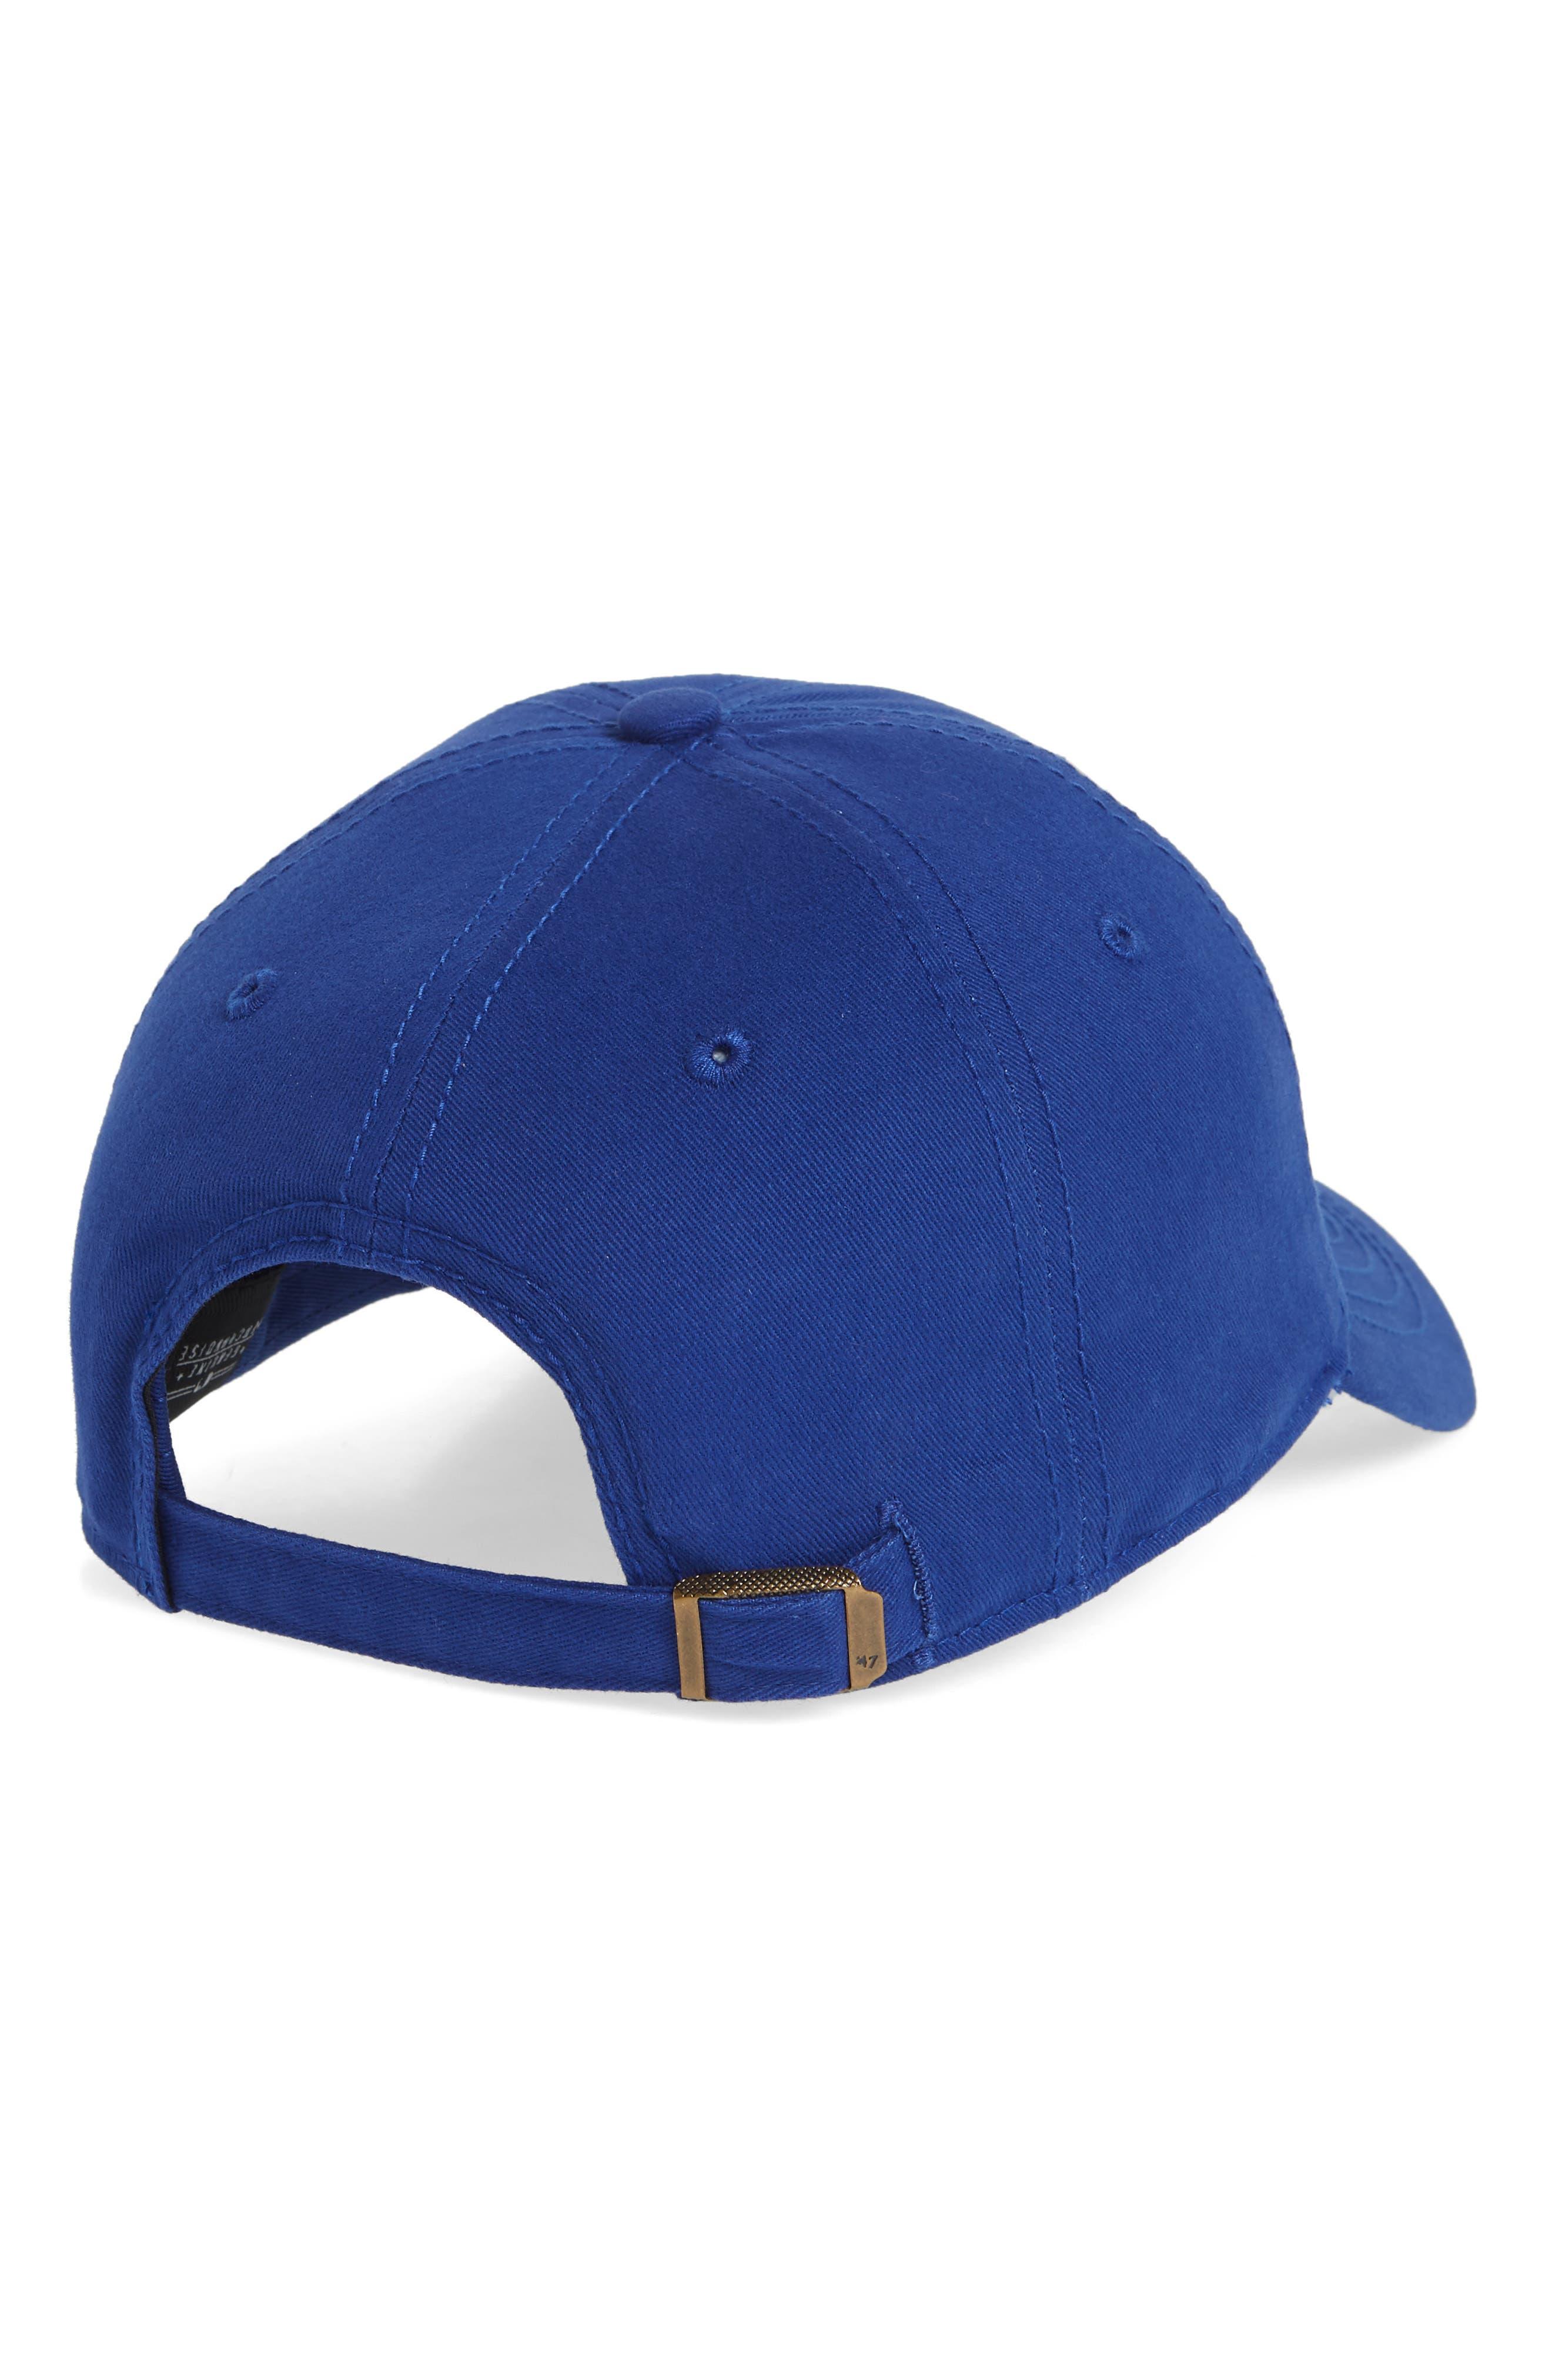 Miata Clean-Up Los Angeles Dodgers Baseball Cap,                             Alternate thumbnail 2, color,                             Royal